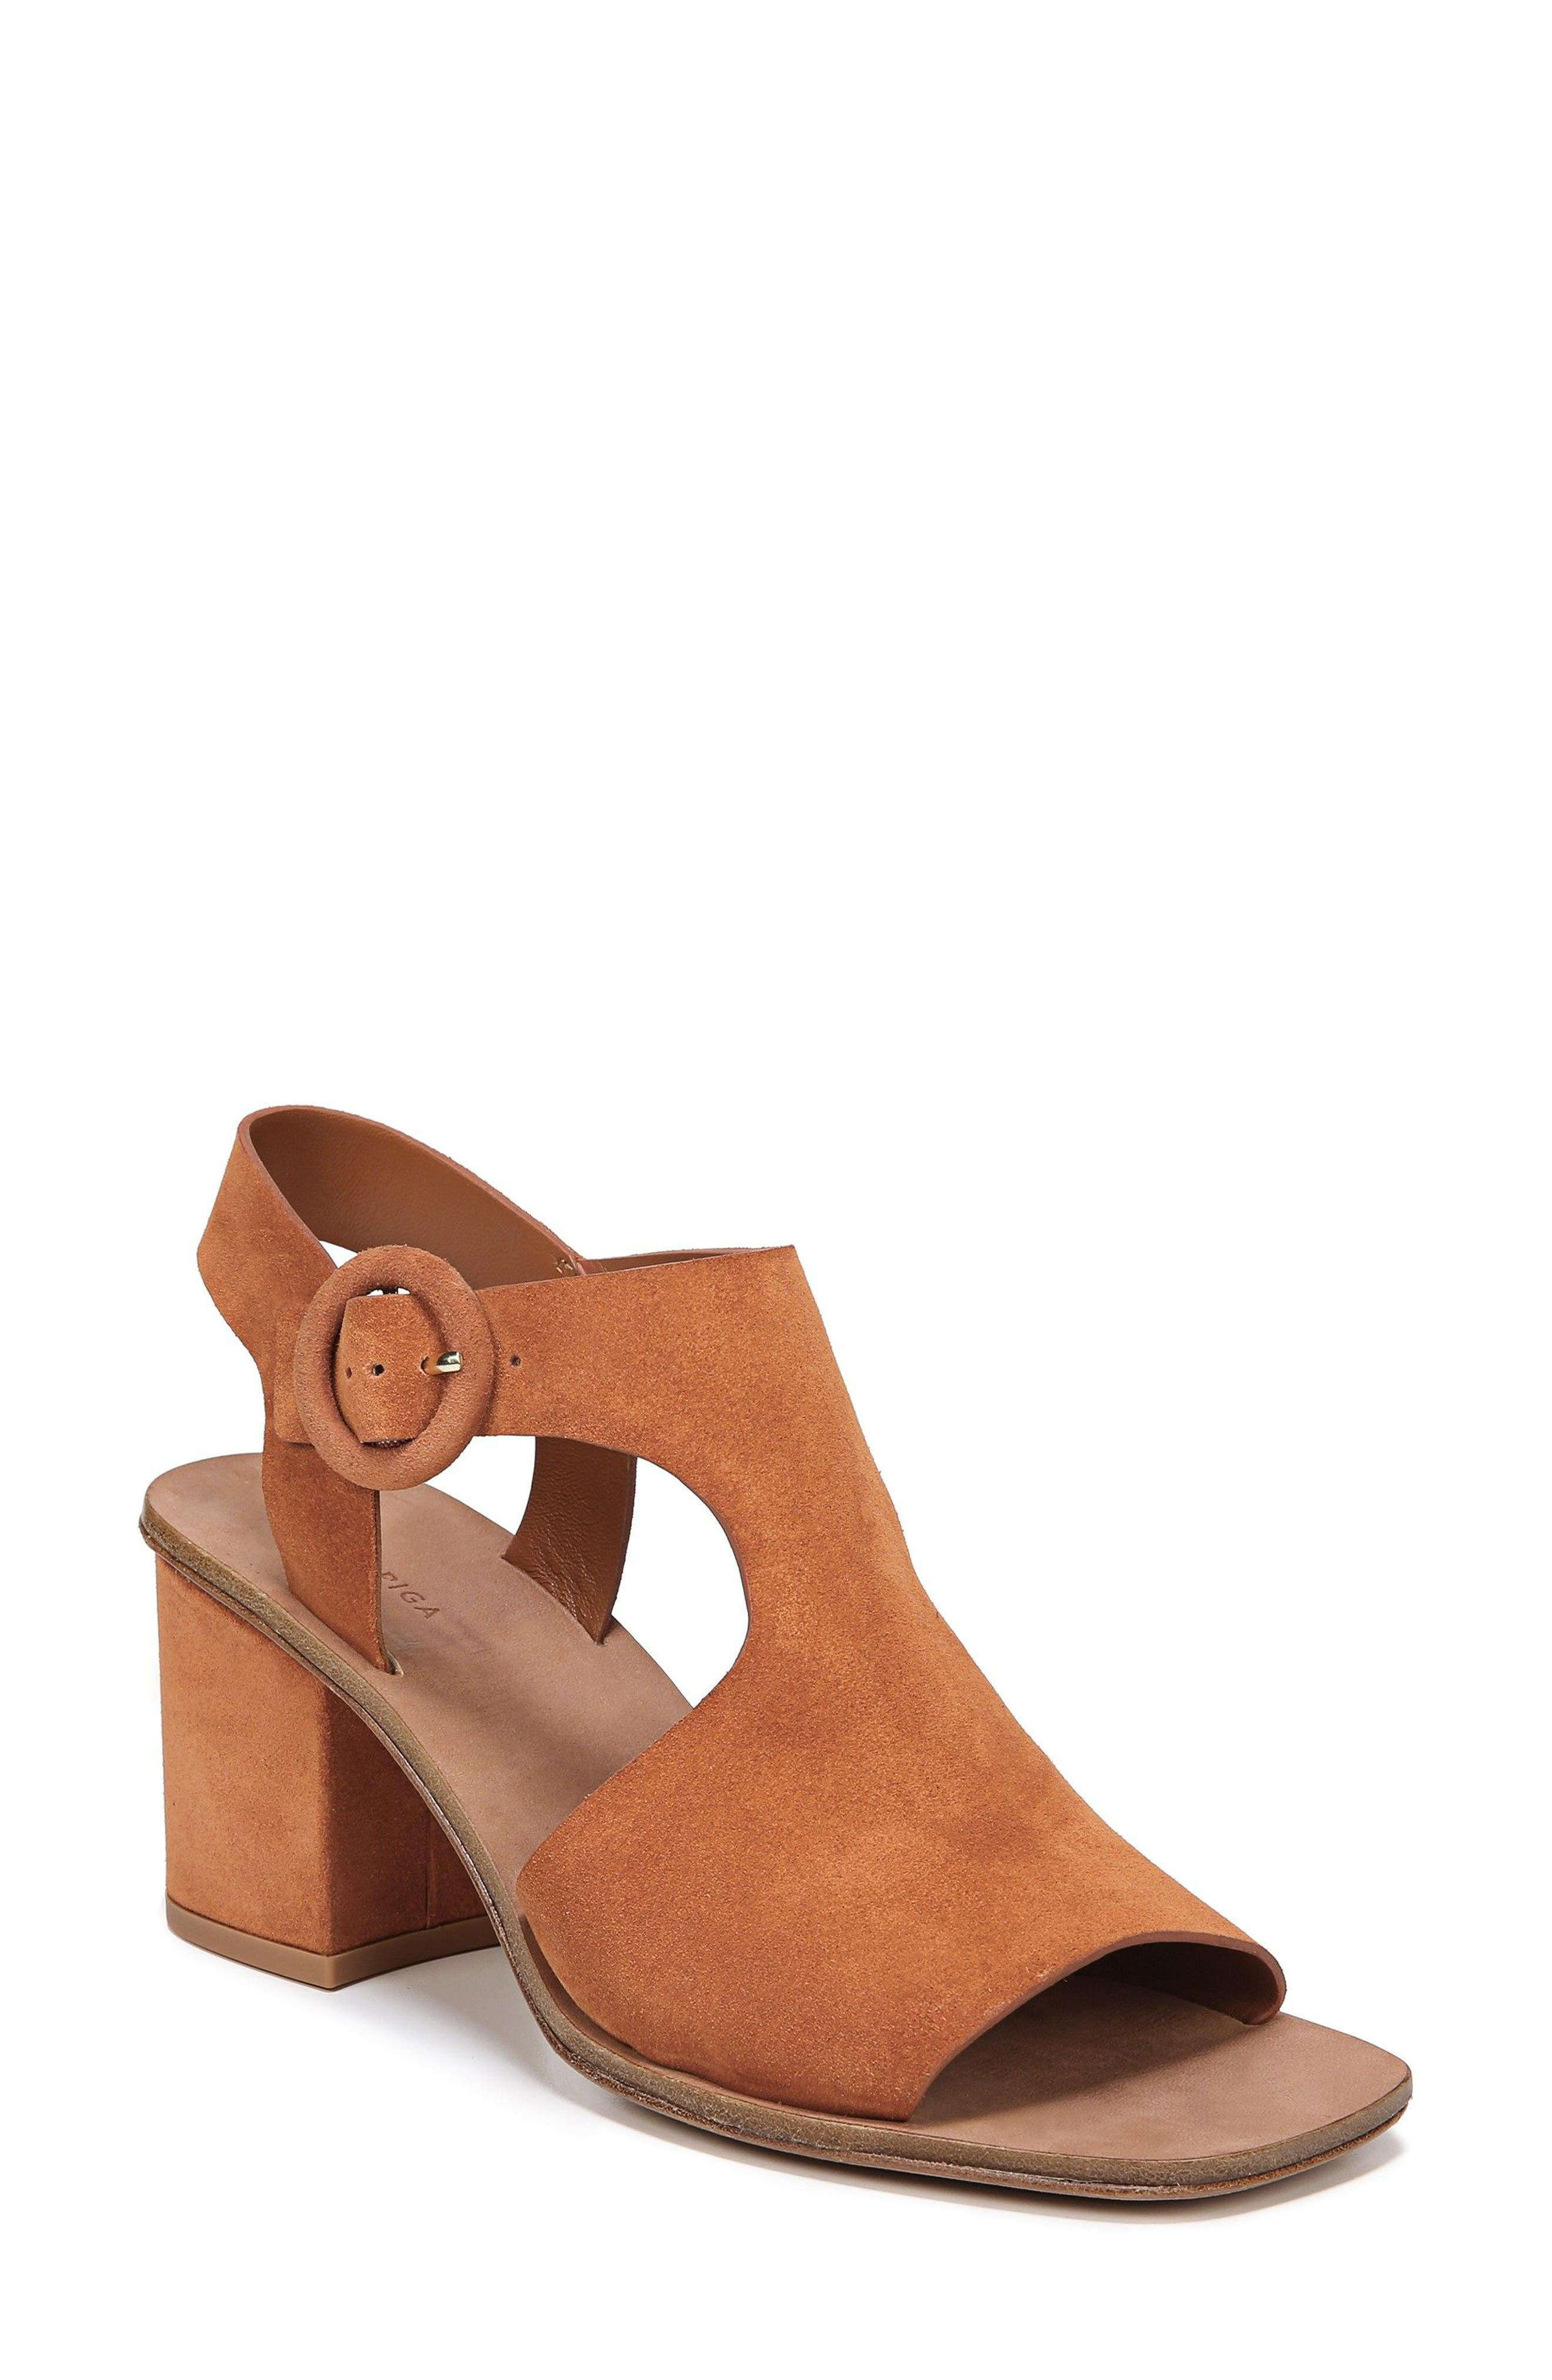 Katya Shield Sandal,                             Main thumbnail 1, color,                             Amber Suede